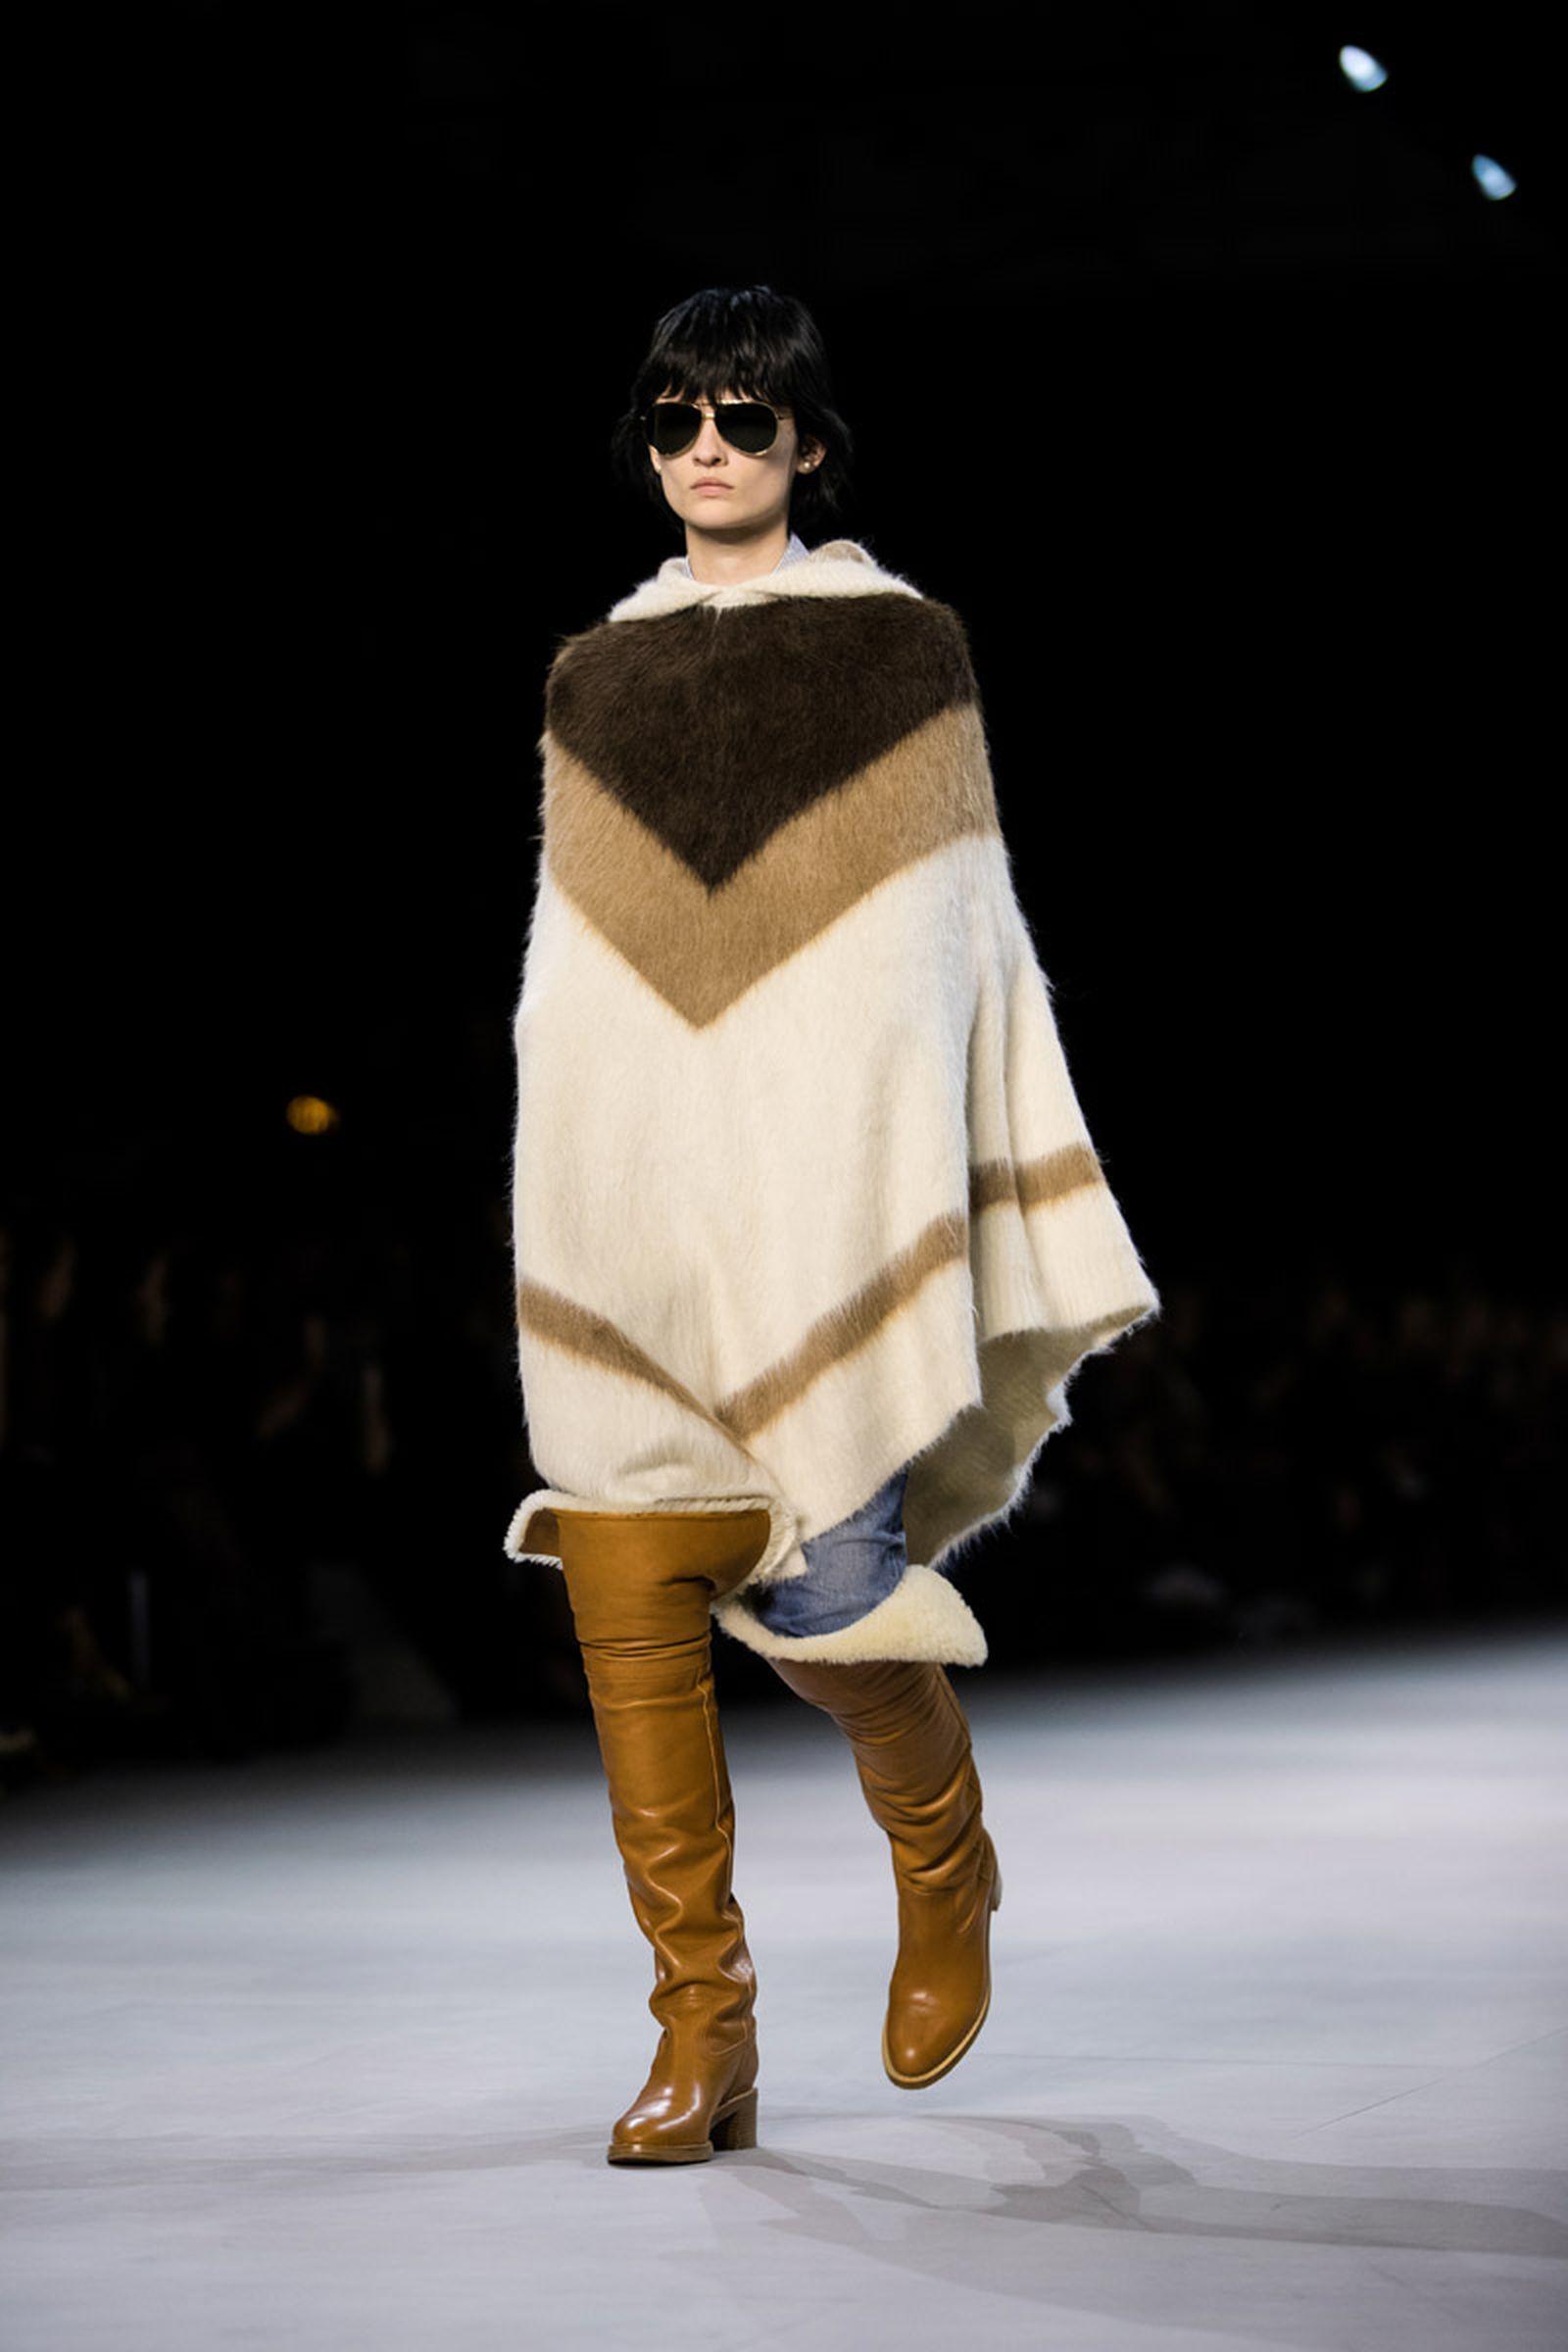 12celine fw19 womens paris fashion week